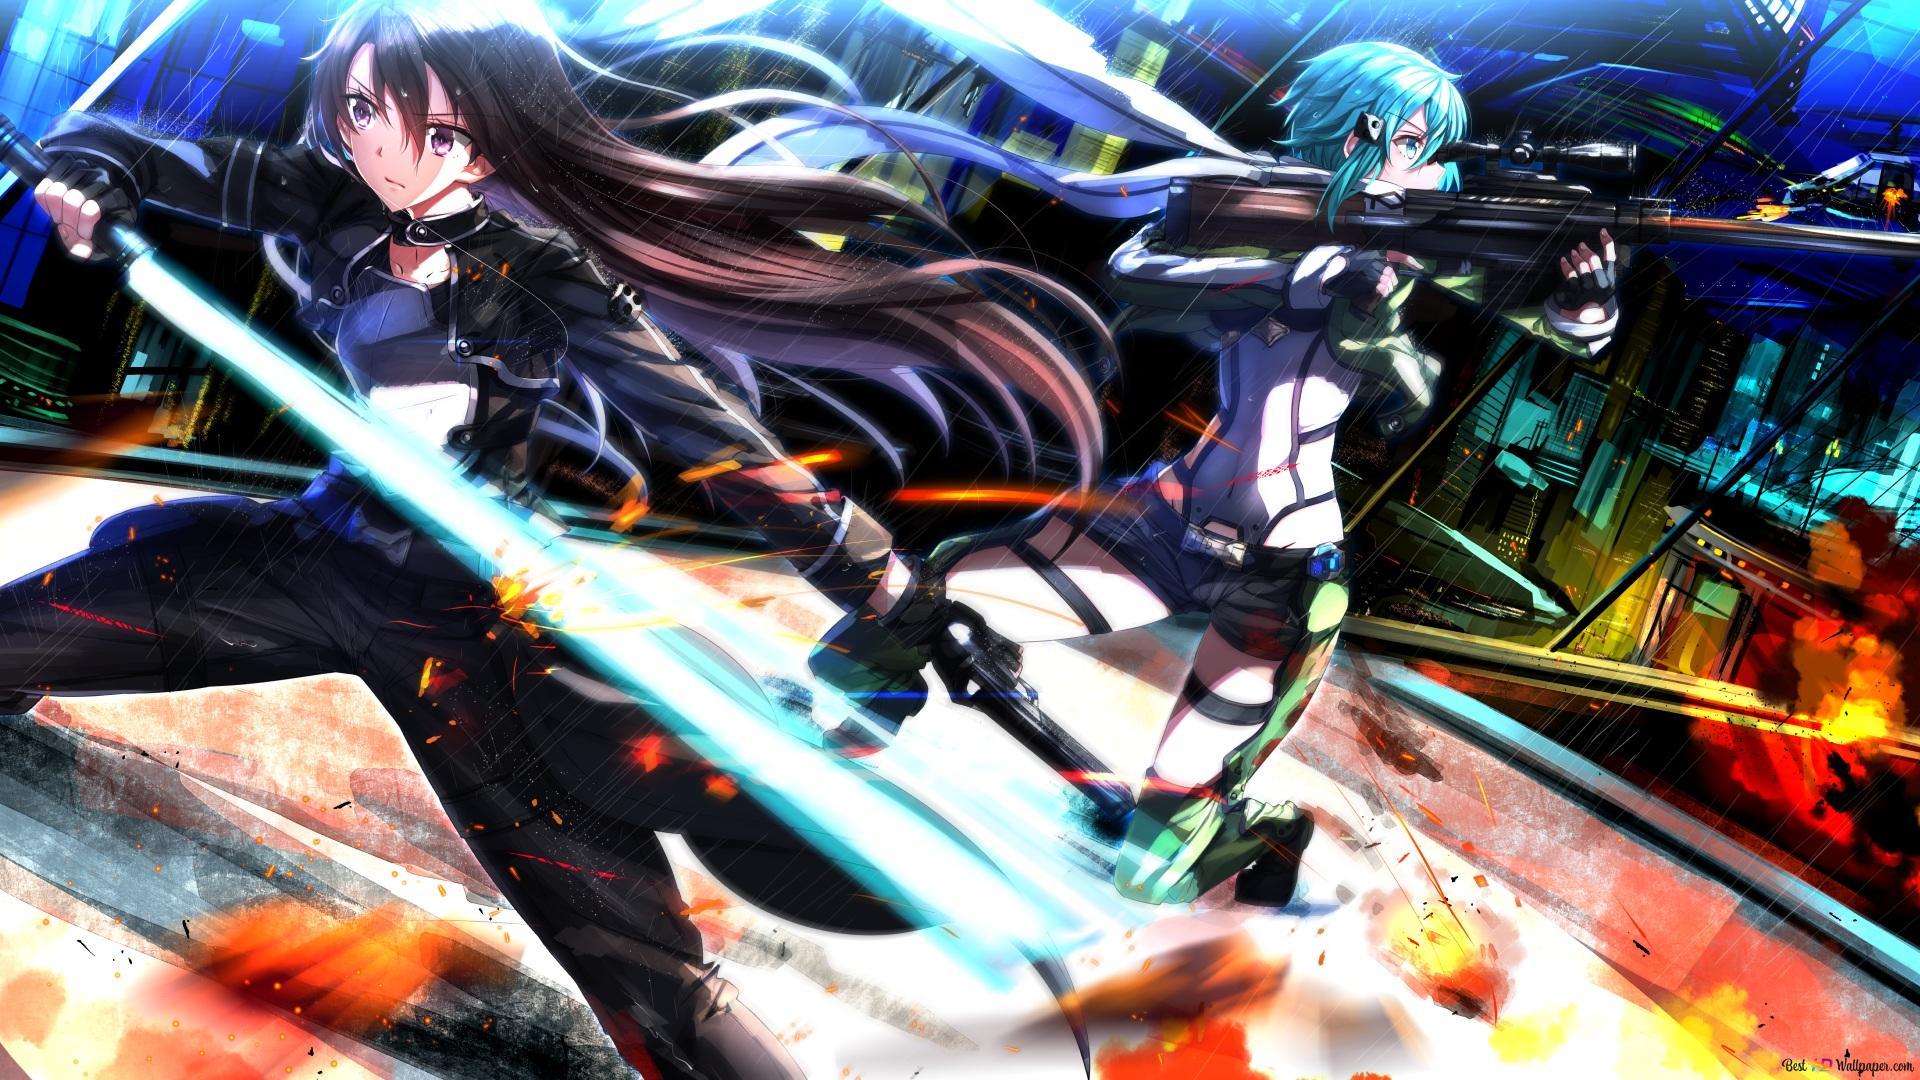 Sword Art Online Ii Kirito Sinon Hd Wallpaper Download